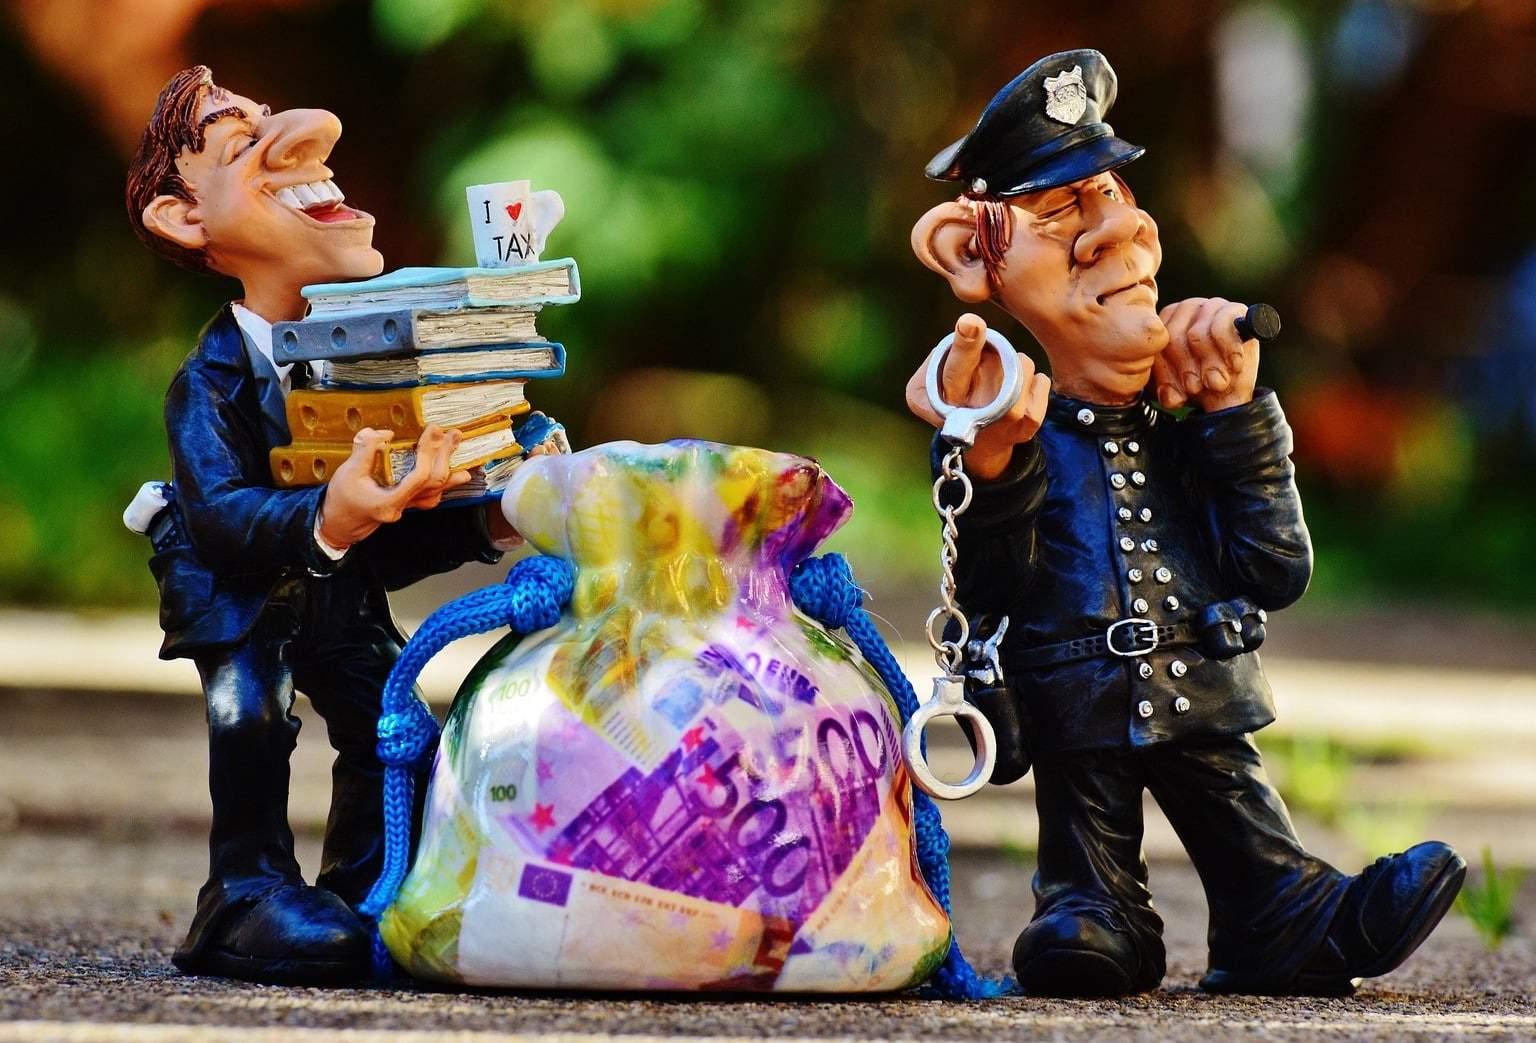 manuel mode d'emploi evasion fiscale